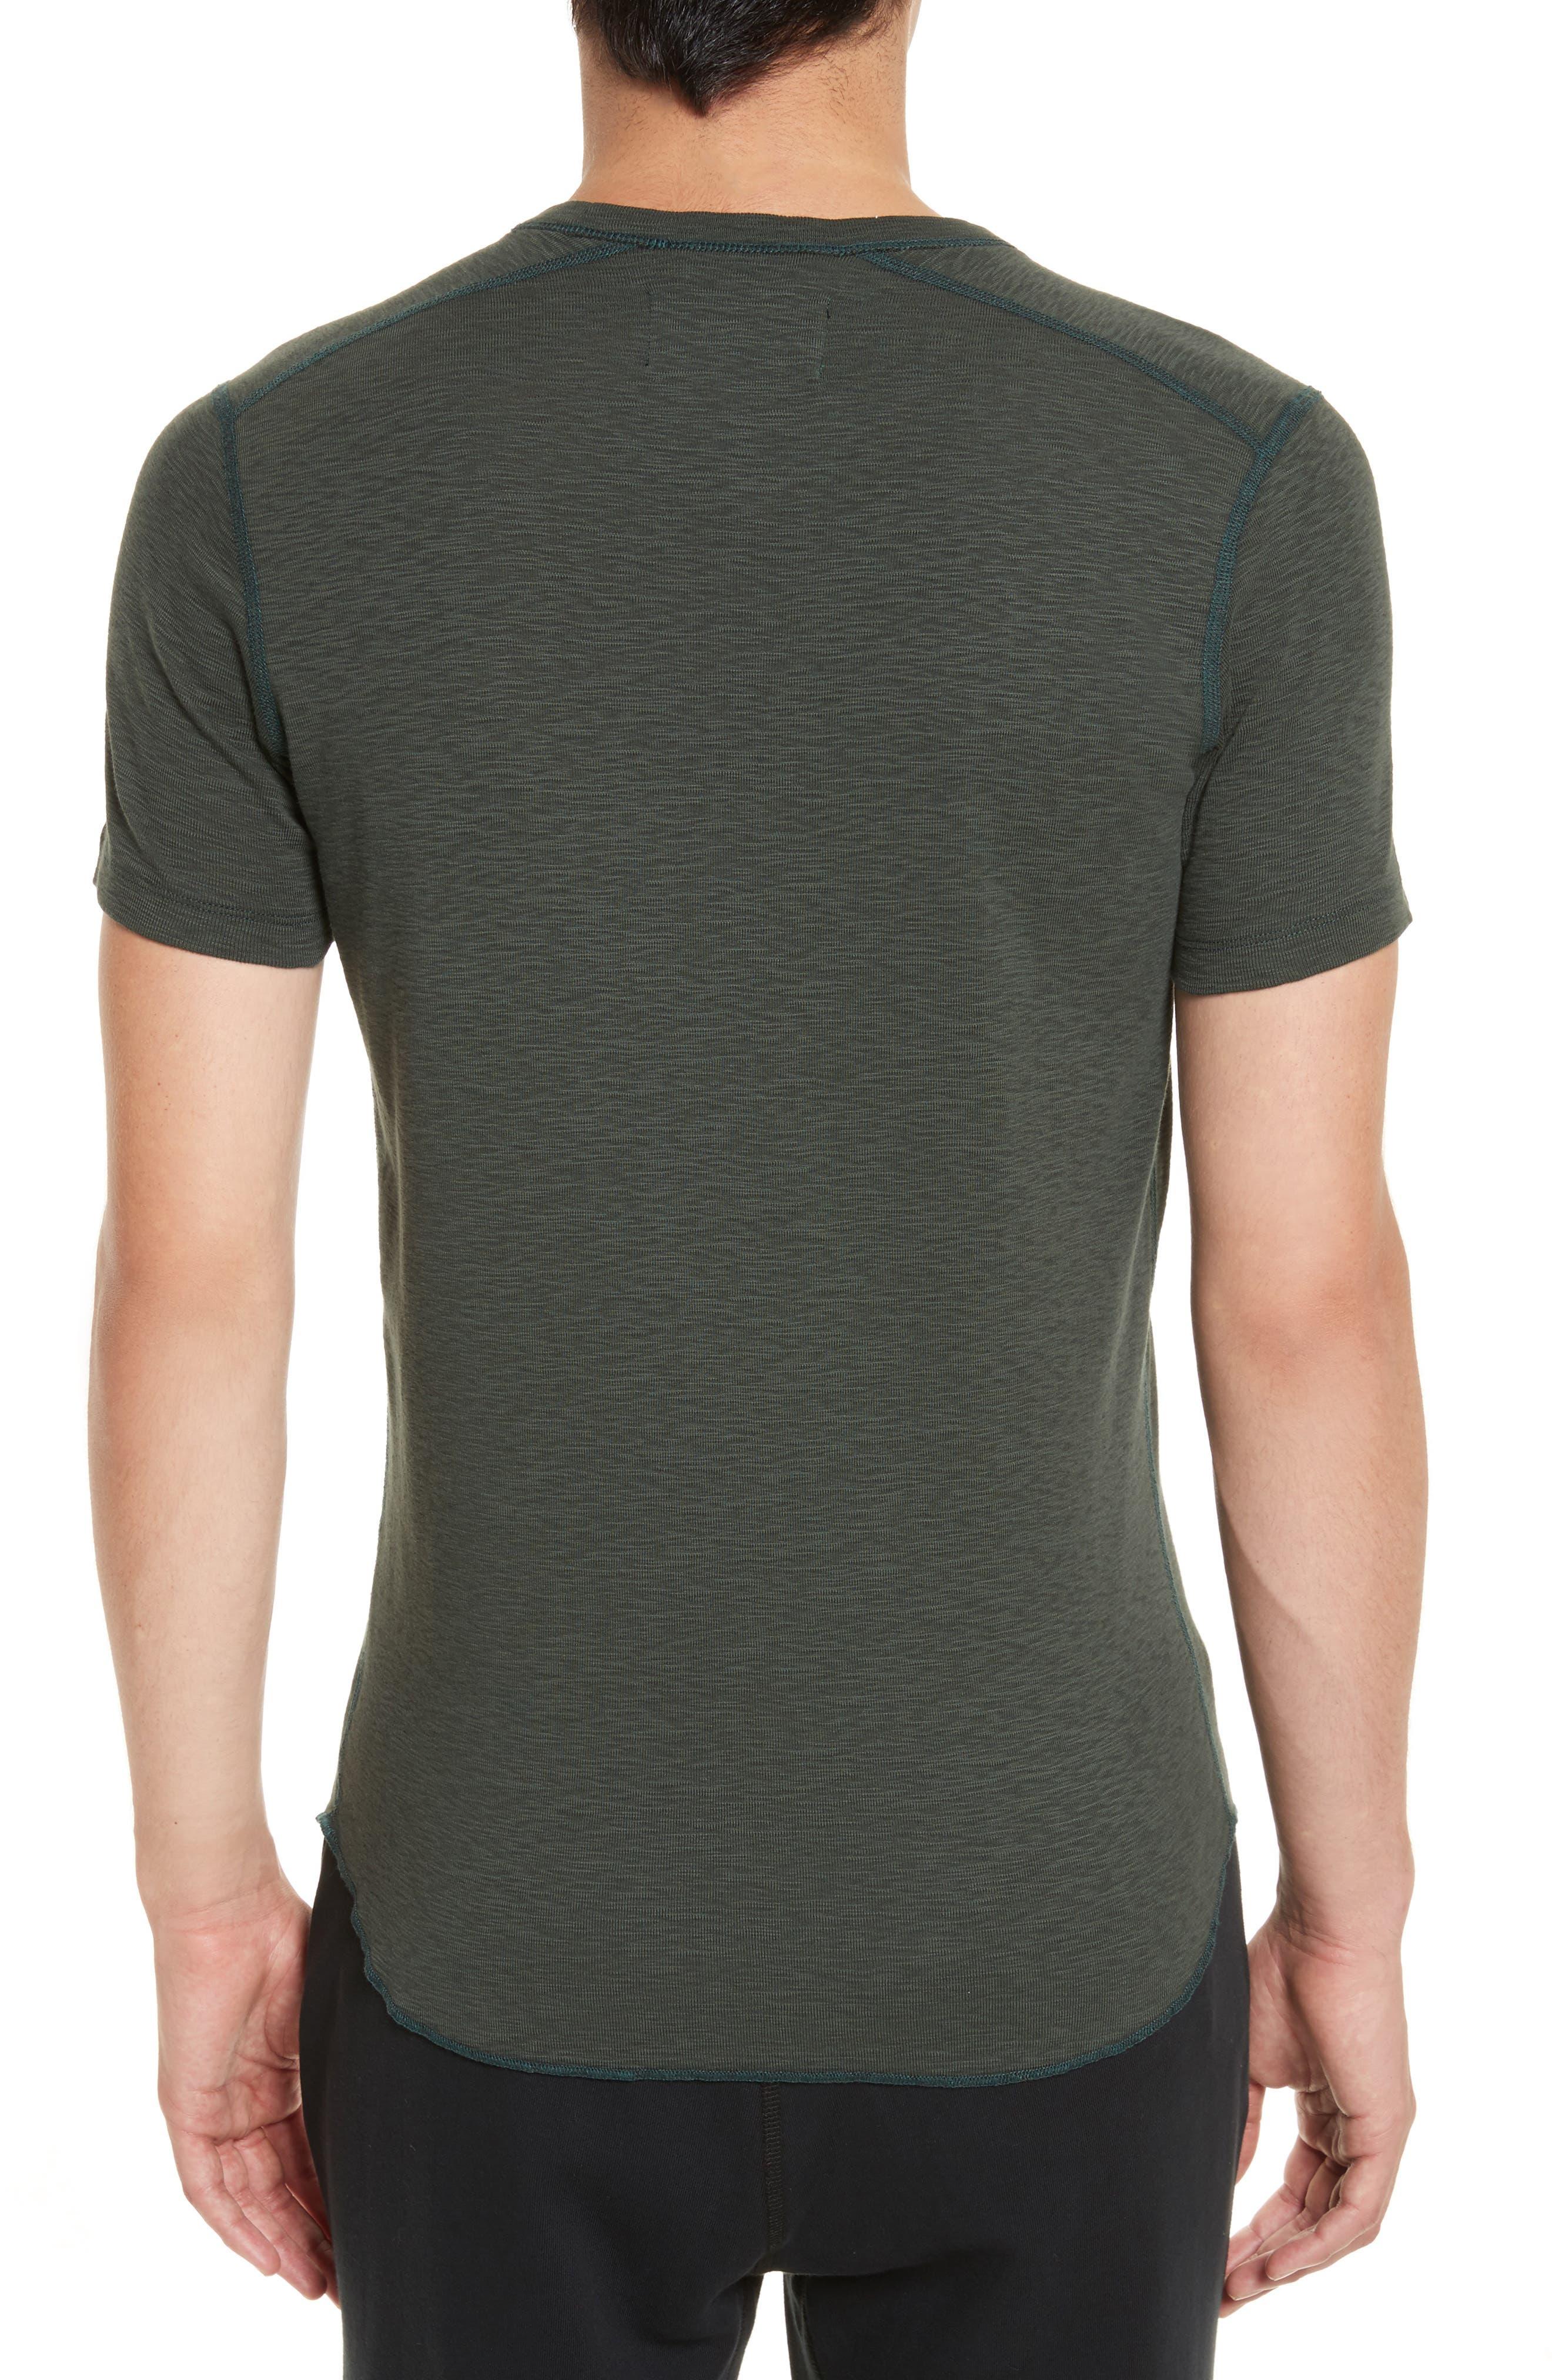 Alternate Image 2  - wings + horns Ribbed Slub Cotton T-Shirt